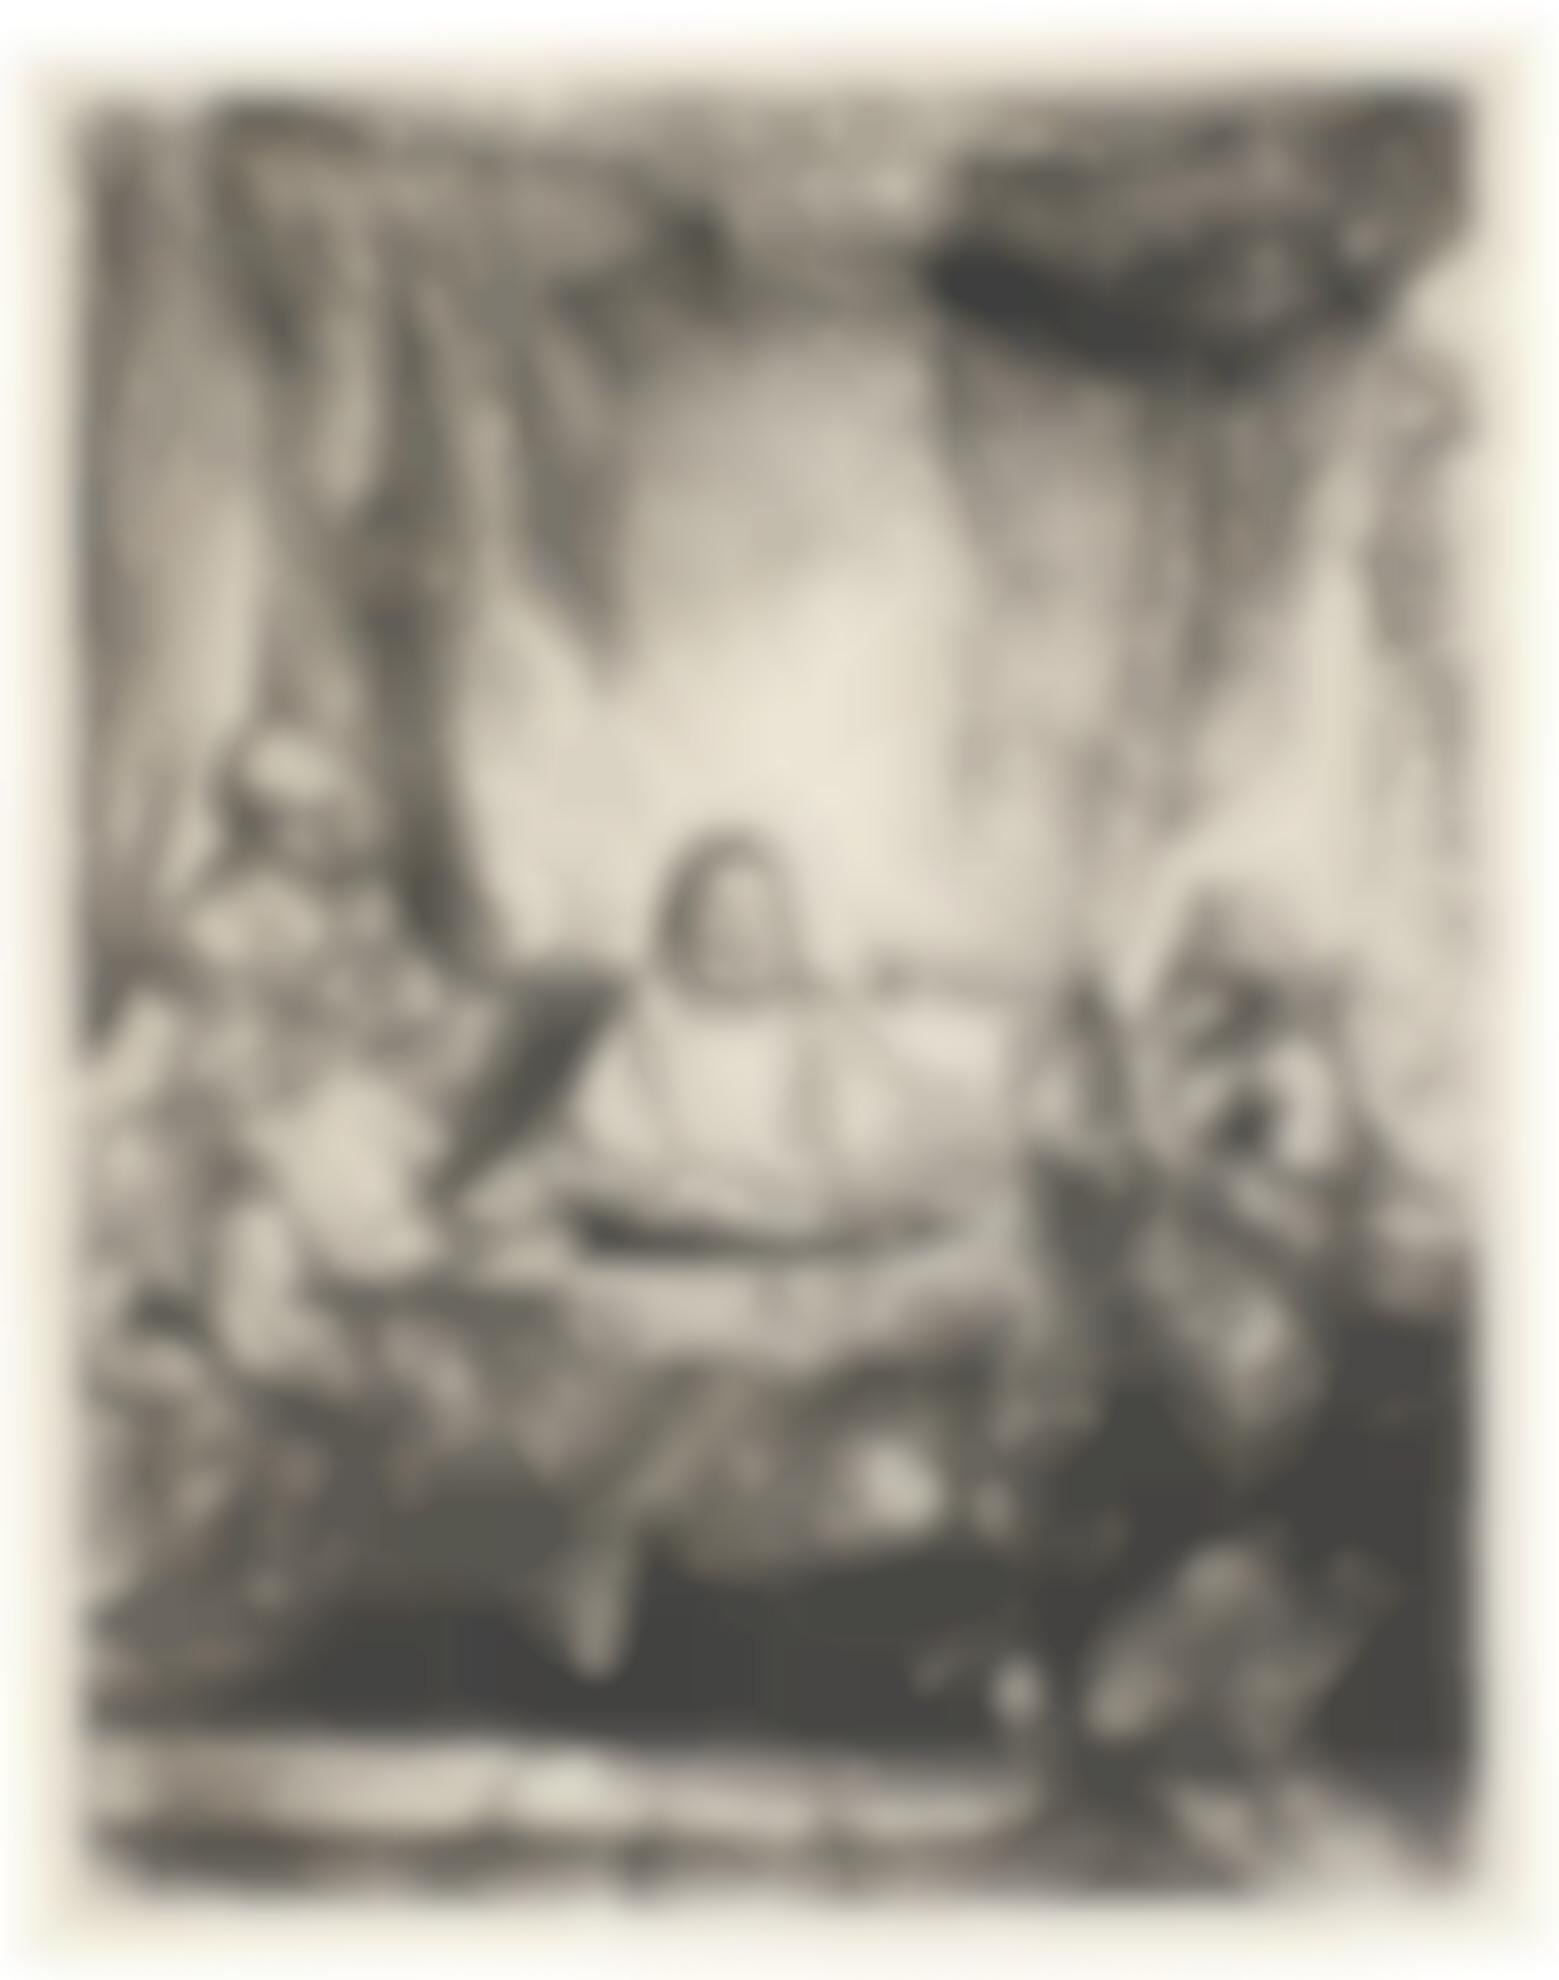 Rembrandt van Rijn-Christ At Emmaus: The Larger Plate (B., Holl. 87; New Holl. 283; H. 282)-1654